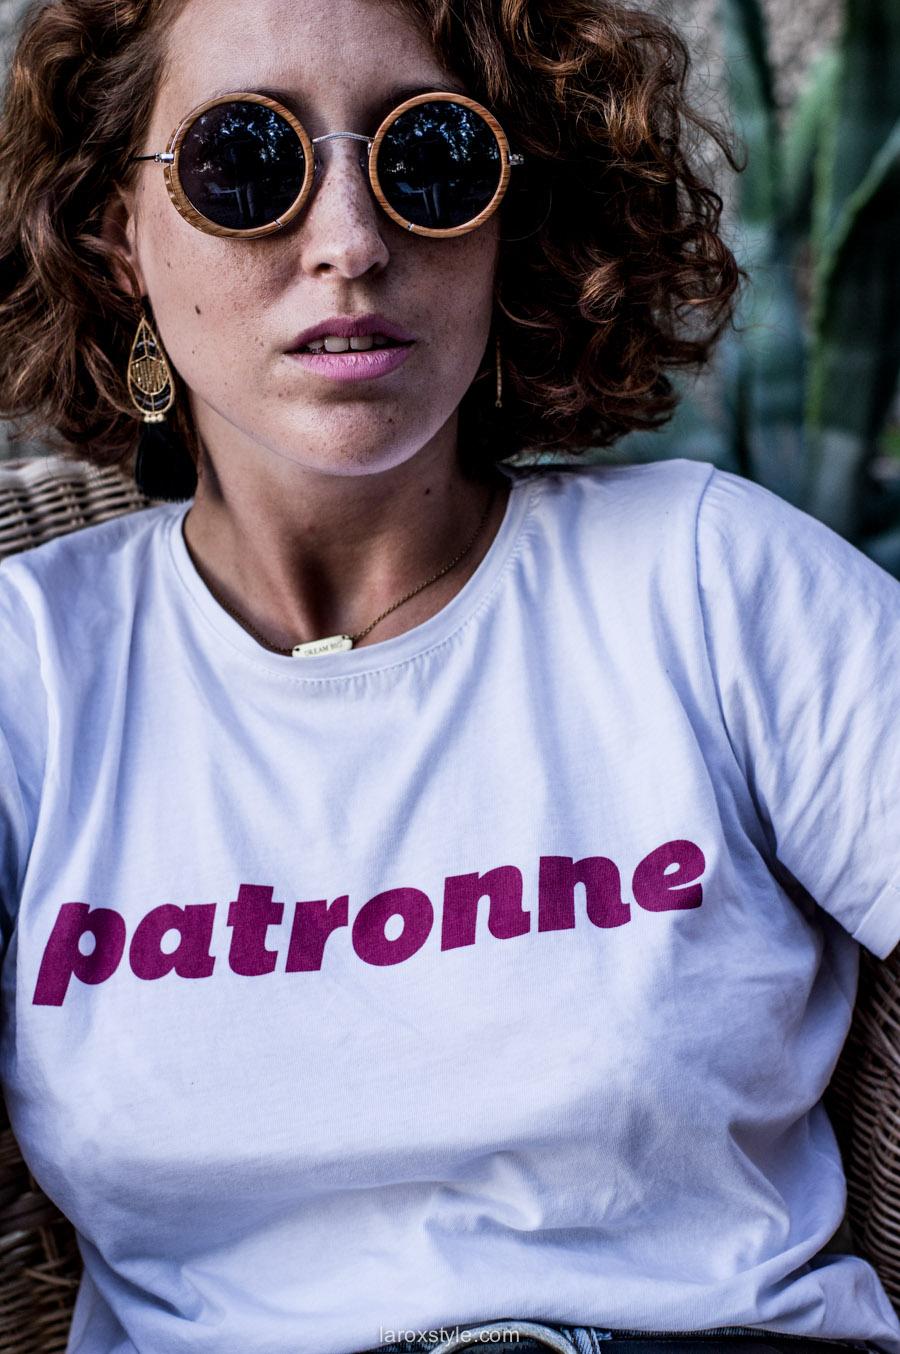 be a boss - girl Boss - patronne - blog mode et lifestyle lyon-11